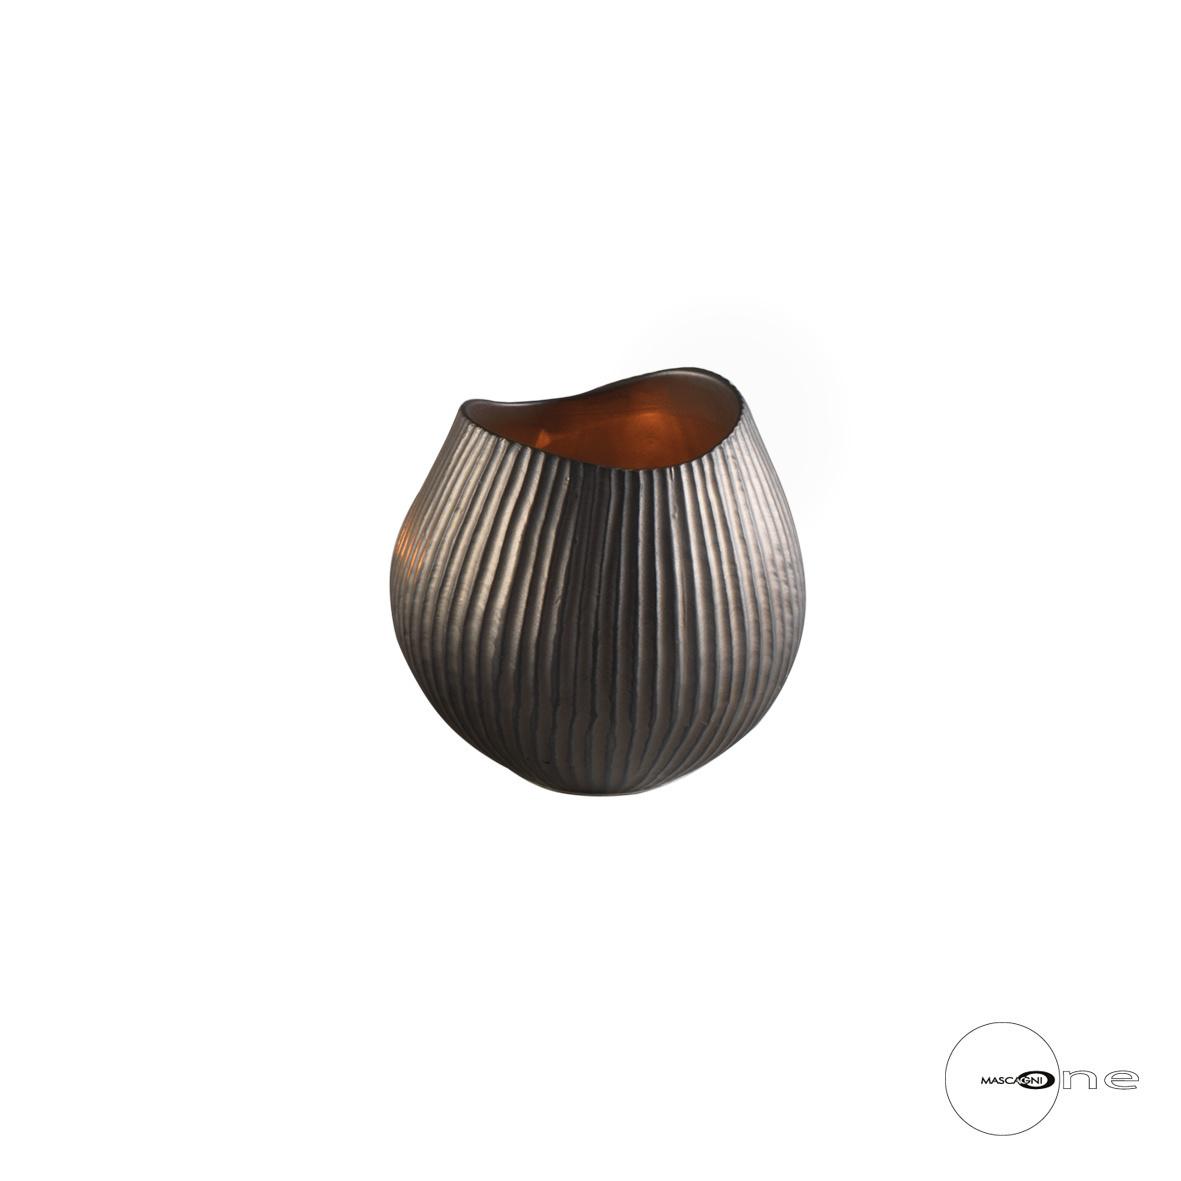 Art Mascagni O1416 CANDLE HOLDER - COL.BRONZE